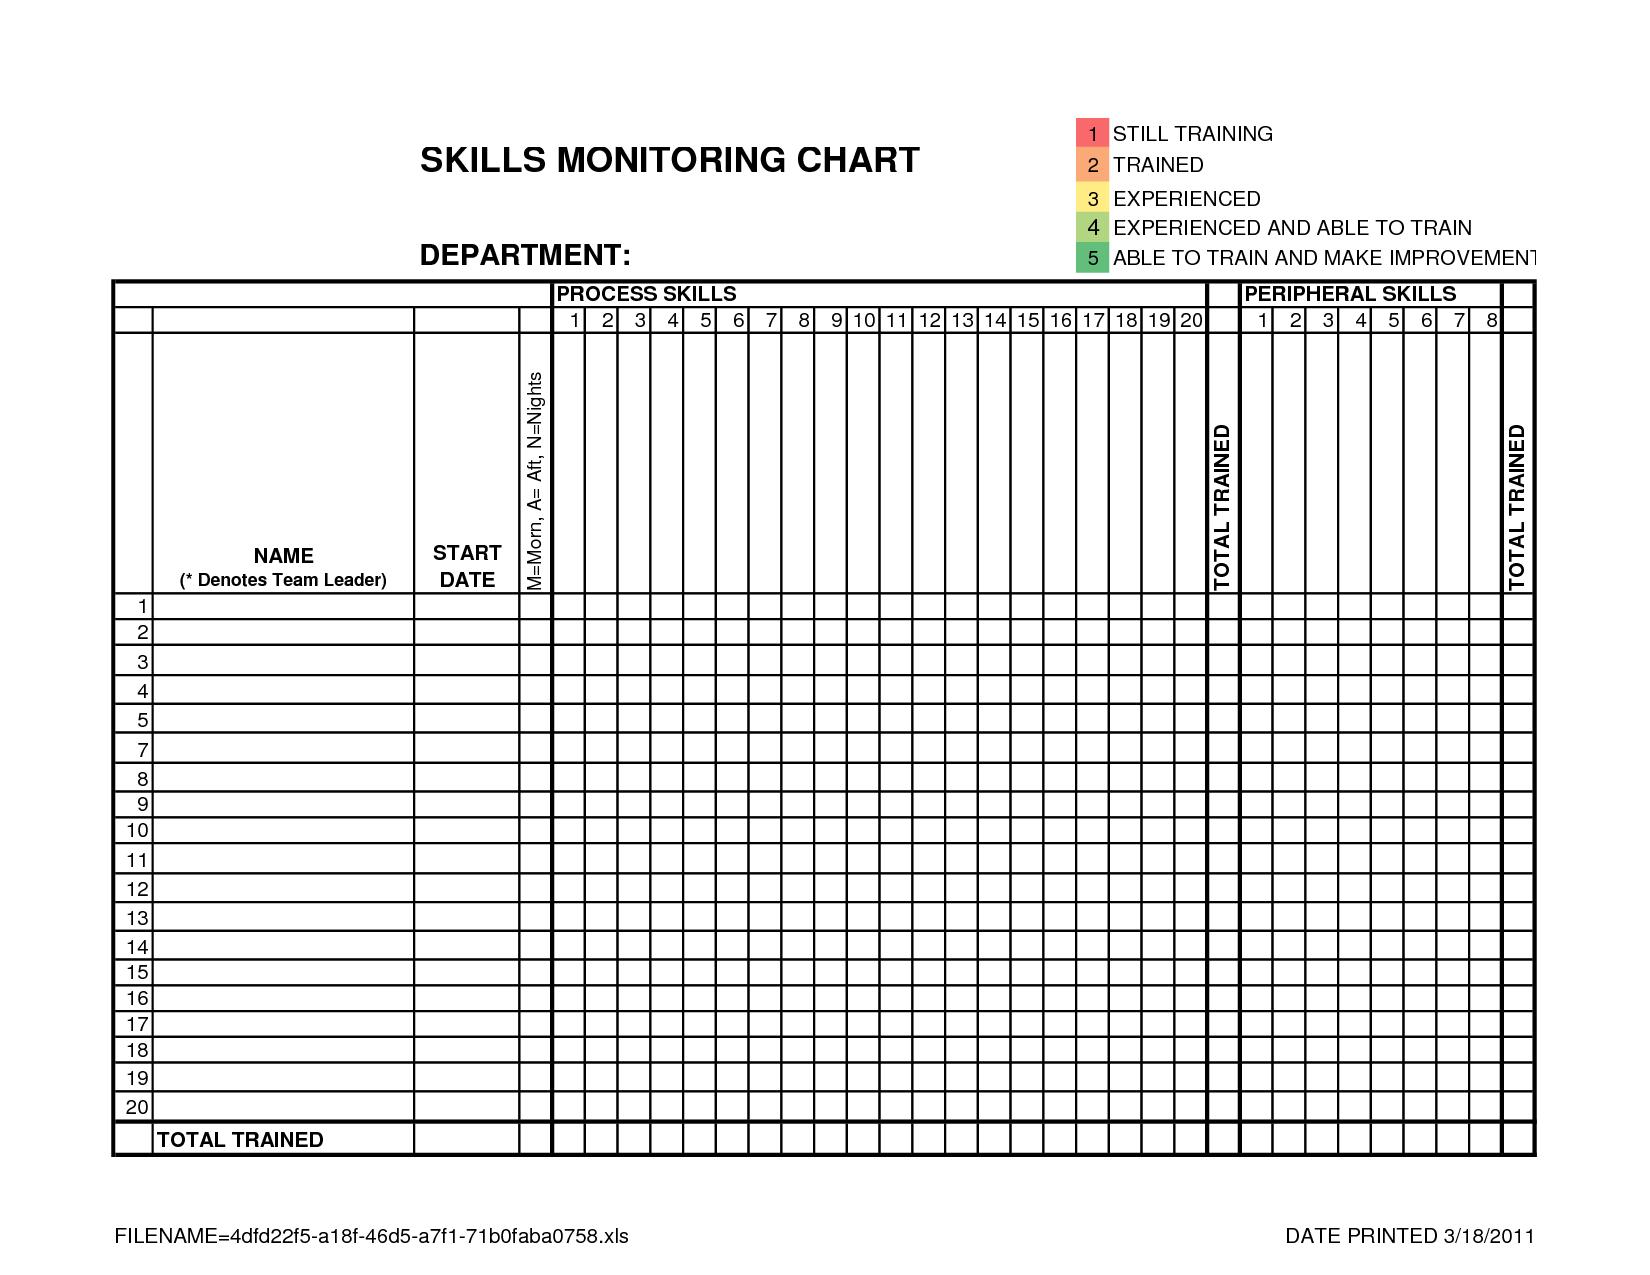 skills matrix template free - Romeo.landinez.co